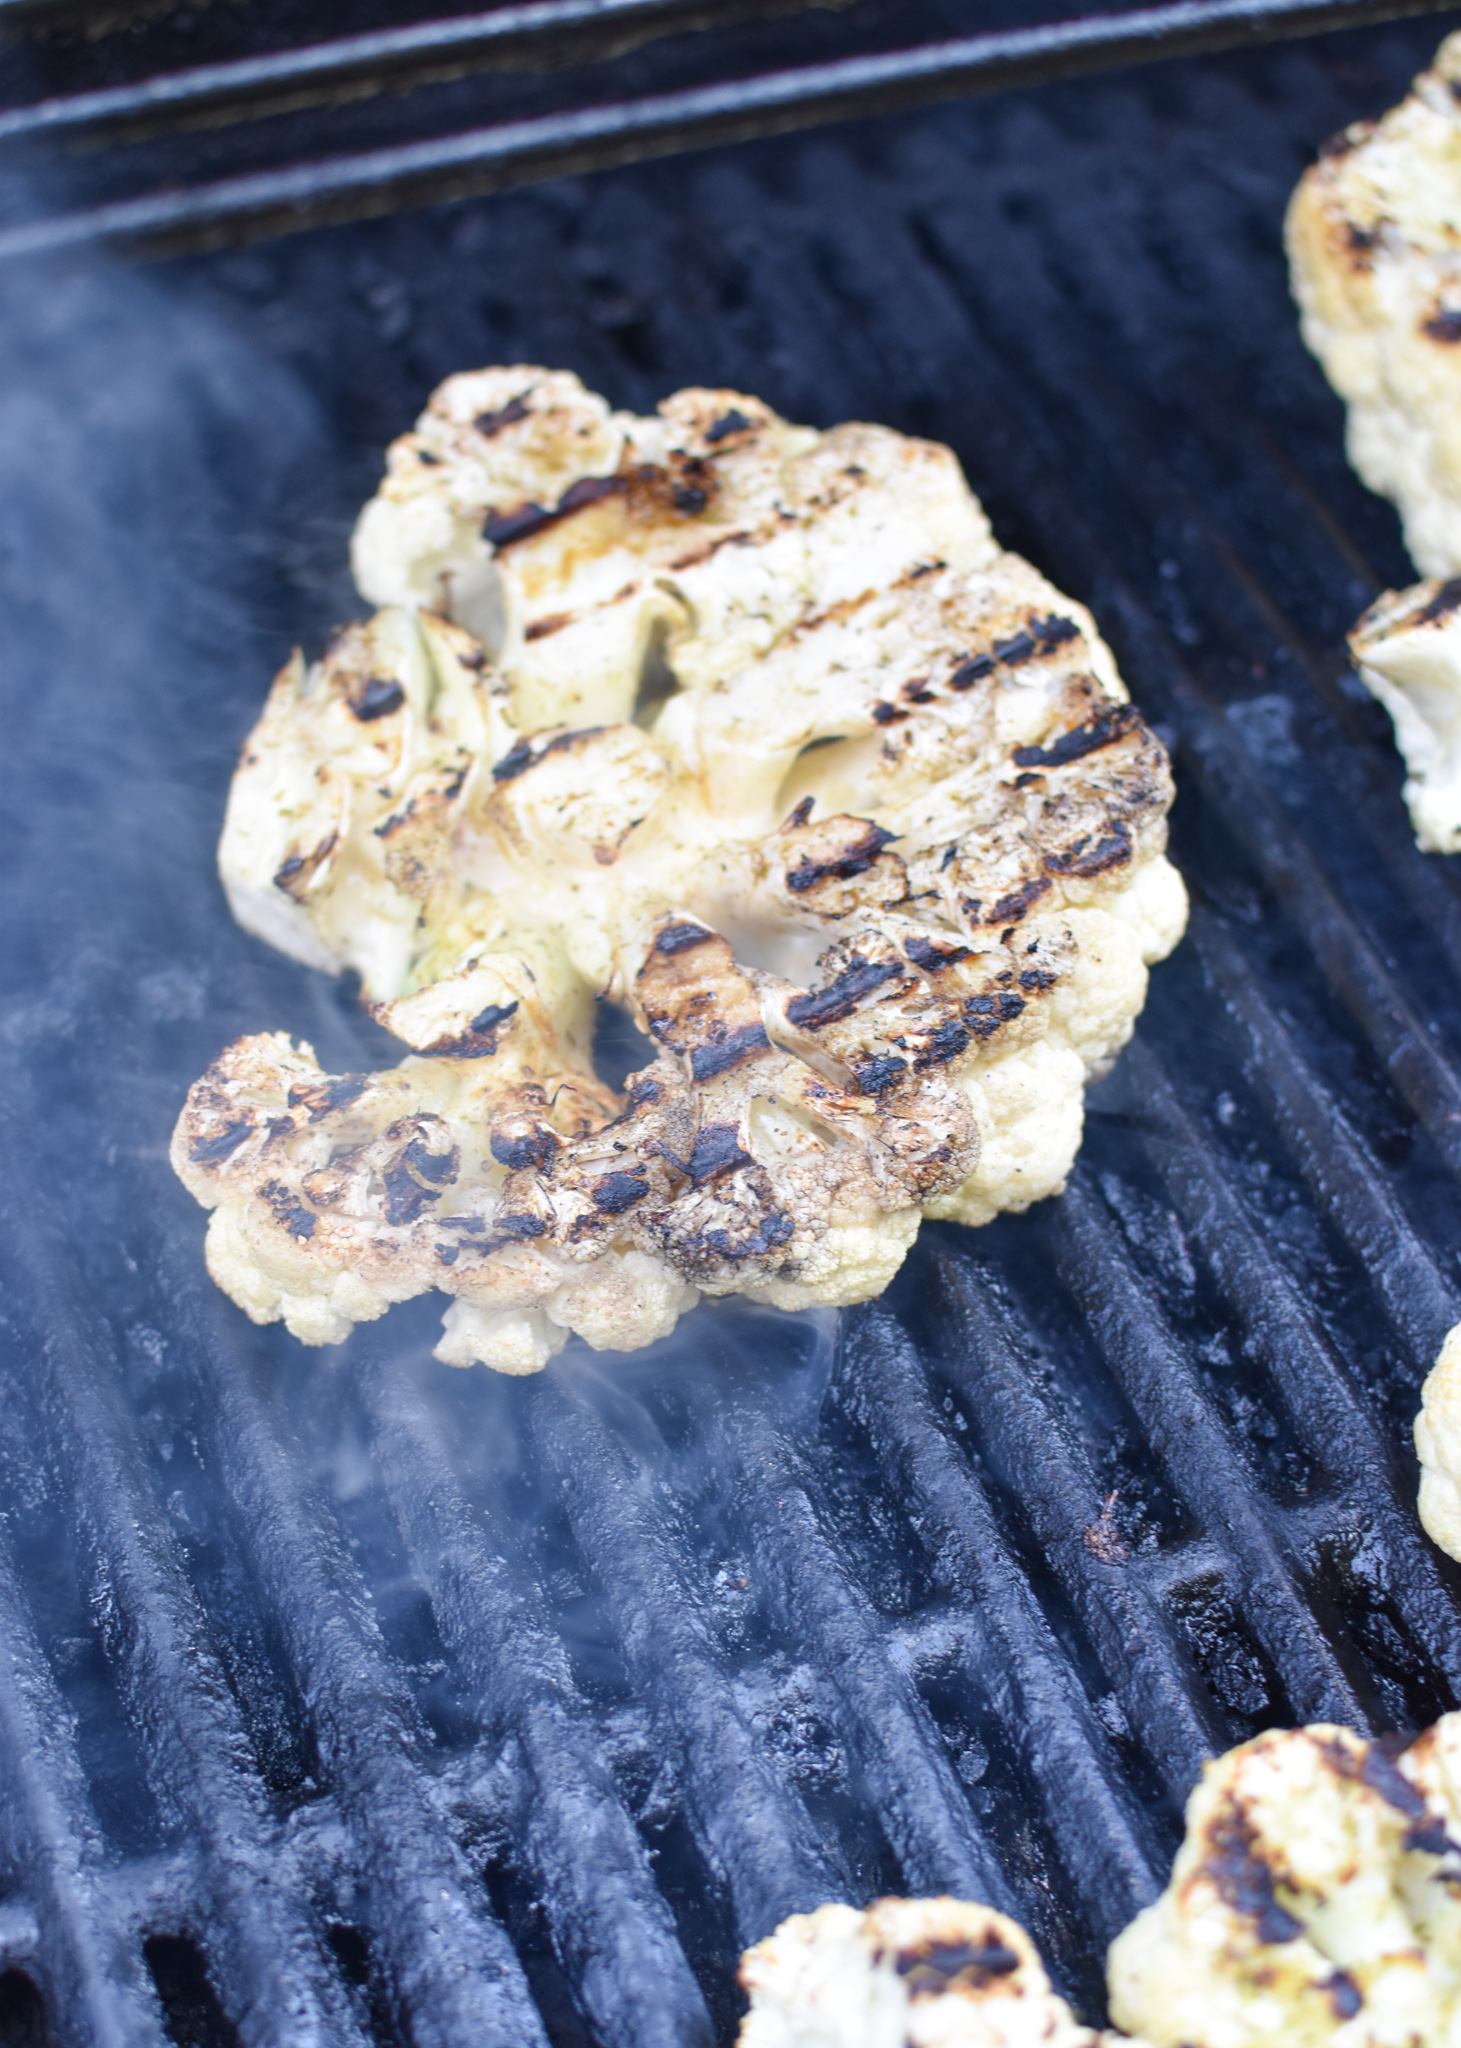 Grilled Cauliflower Steaks with Yogurt Tahini Sauce on grill.